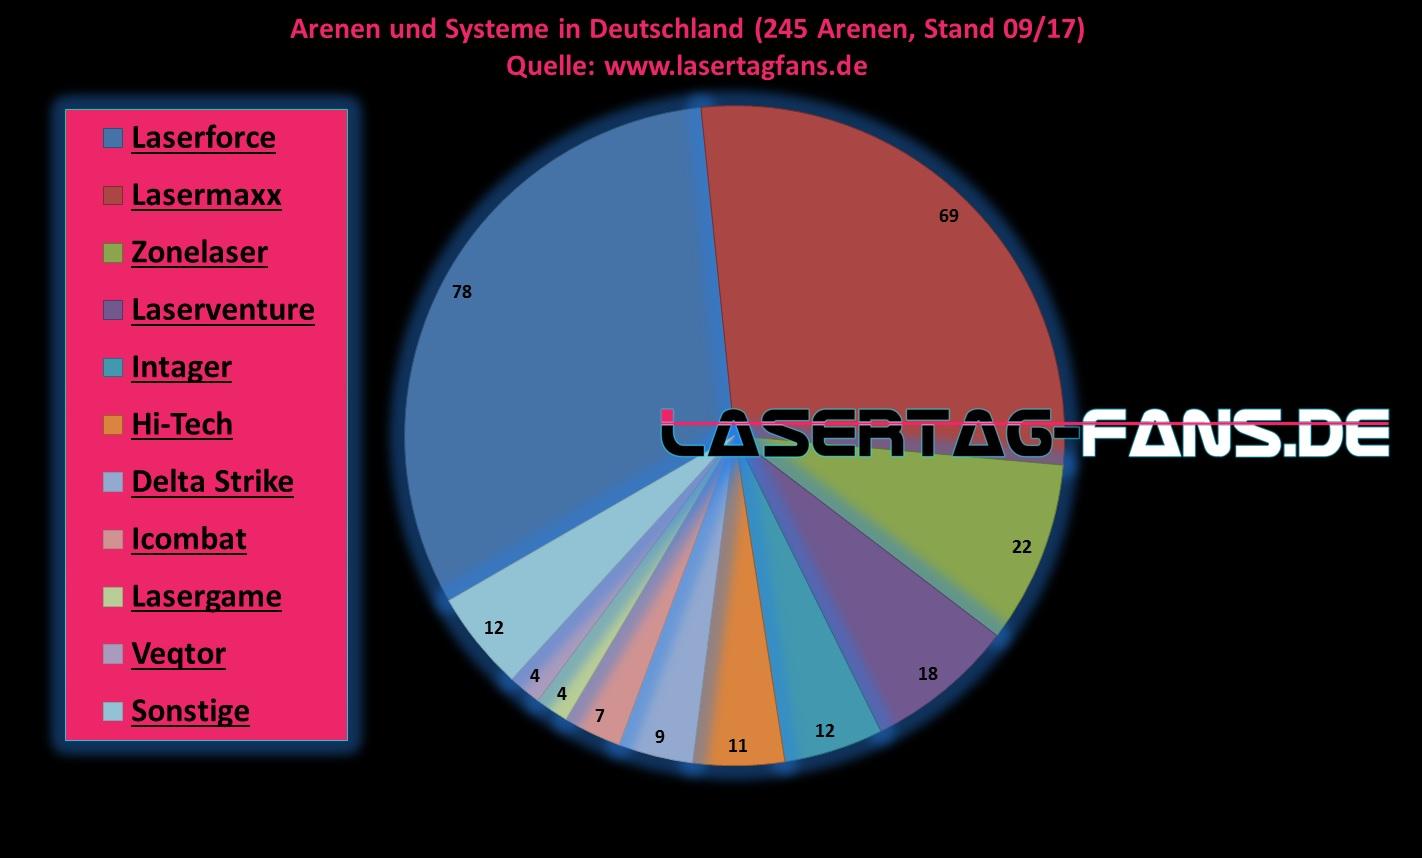 Statistik Lasertagfans Arenen September 2017